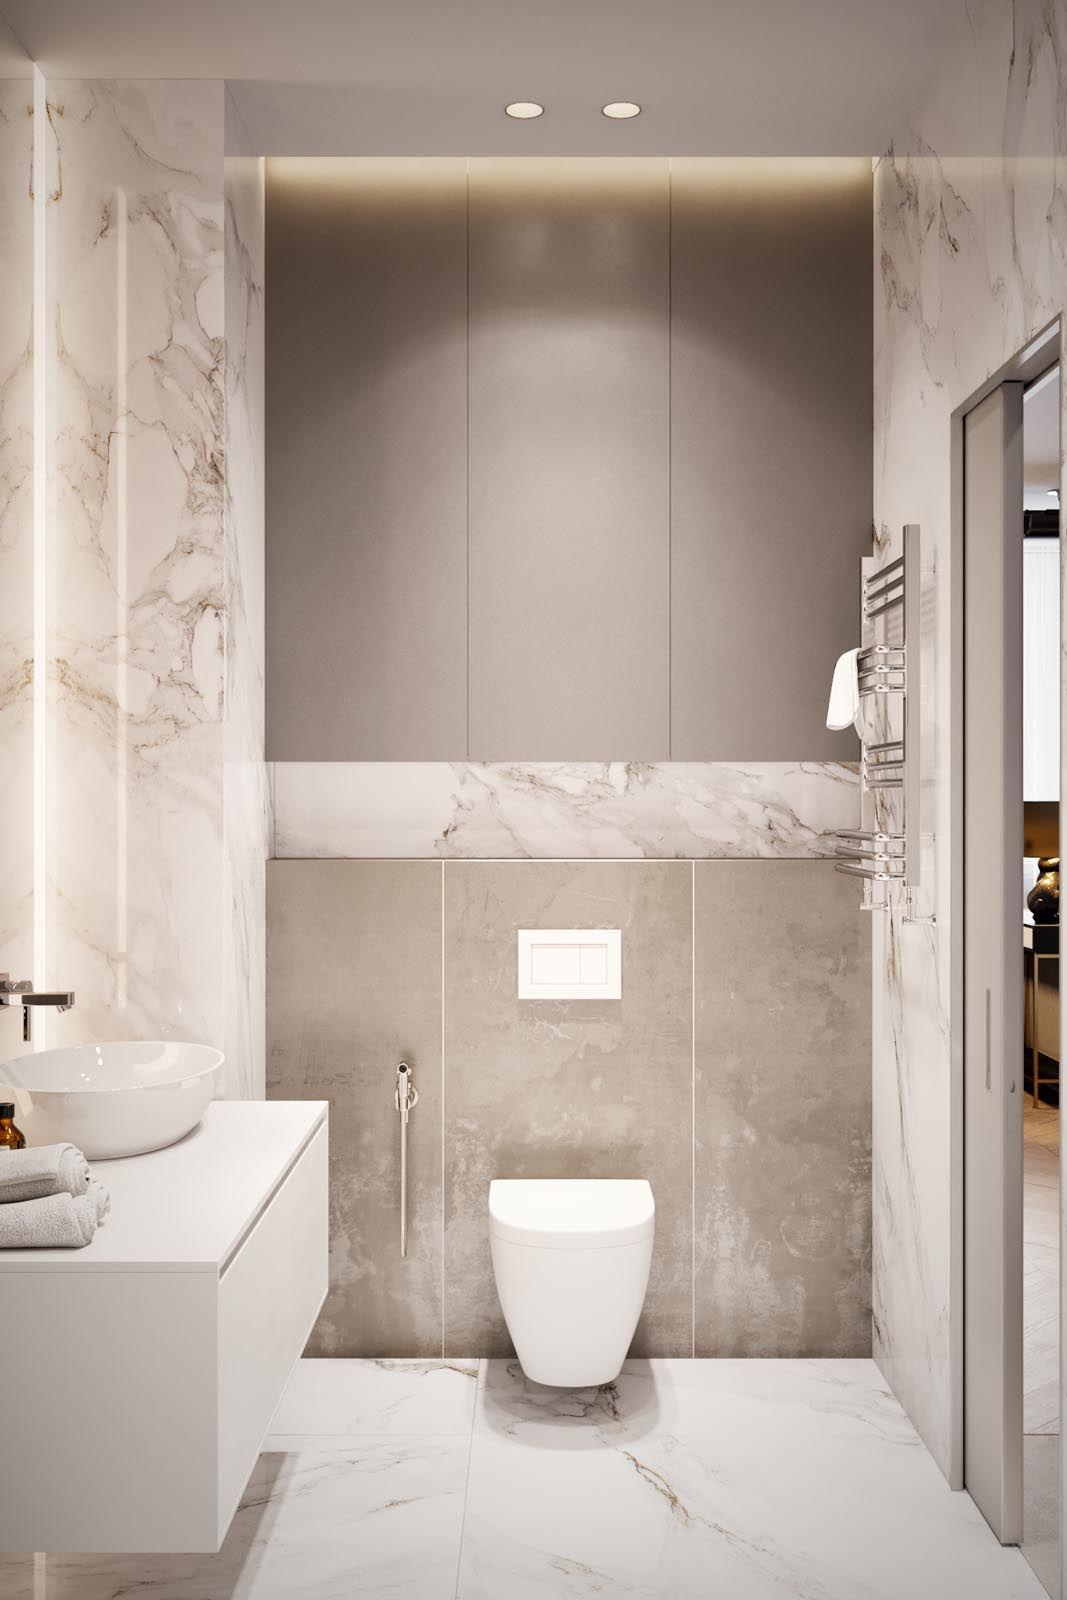 Small Bathroom Ideas Bathroom Design Bathroom Design Planning Bathroom Interior Design Bathroom Design Small Bathroom Interior